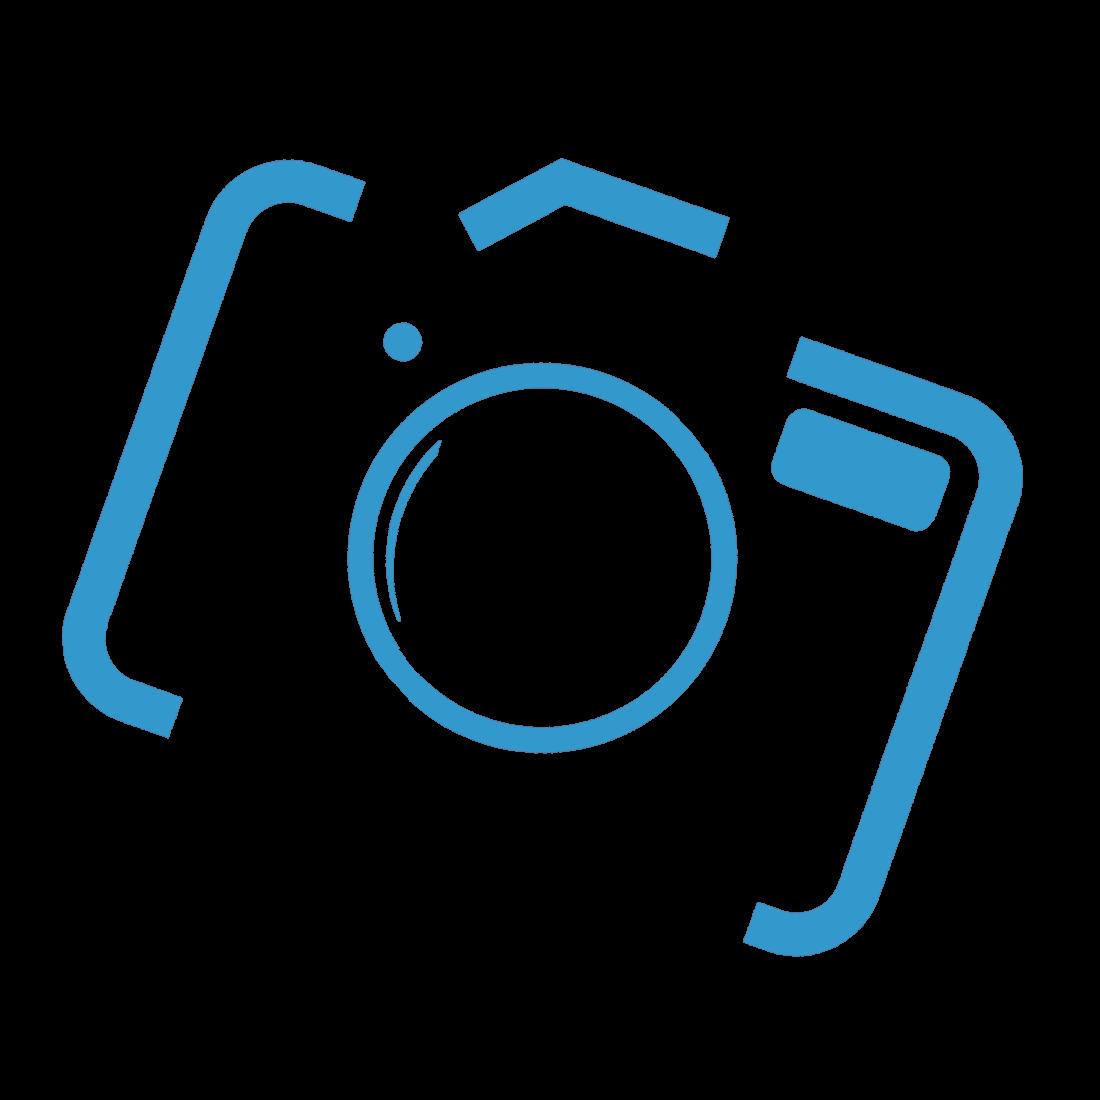 Druckwächter / Analogsensor (10004273)